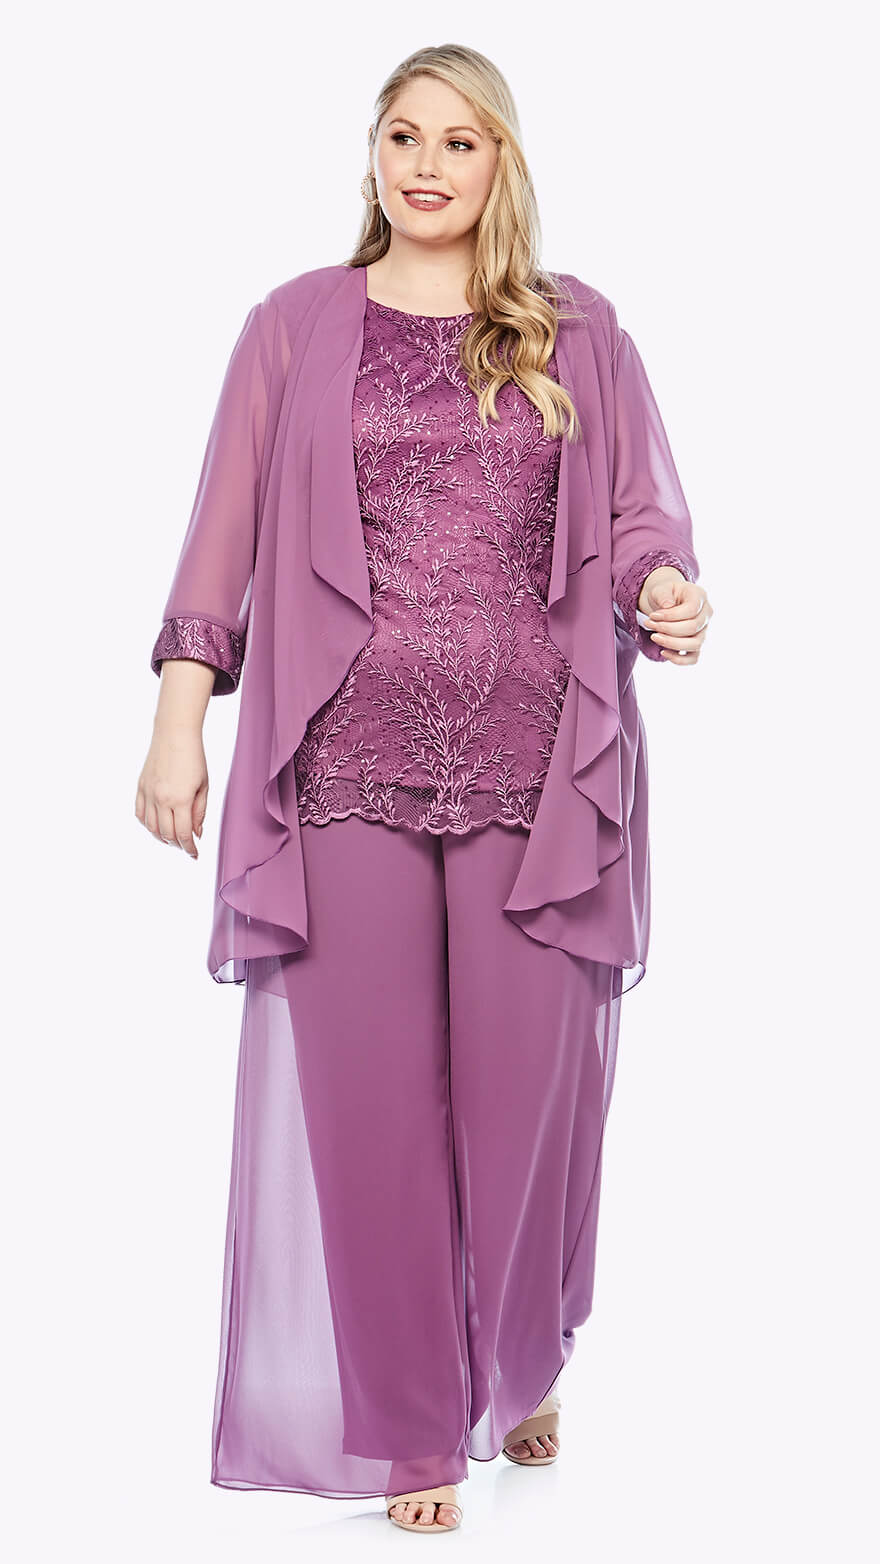 LJ0400 Three-piece outfit with lace top and scalloped hem, matching waterfall jacket, and chiffon layered pants